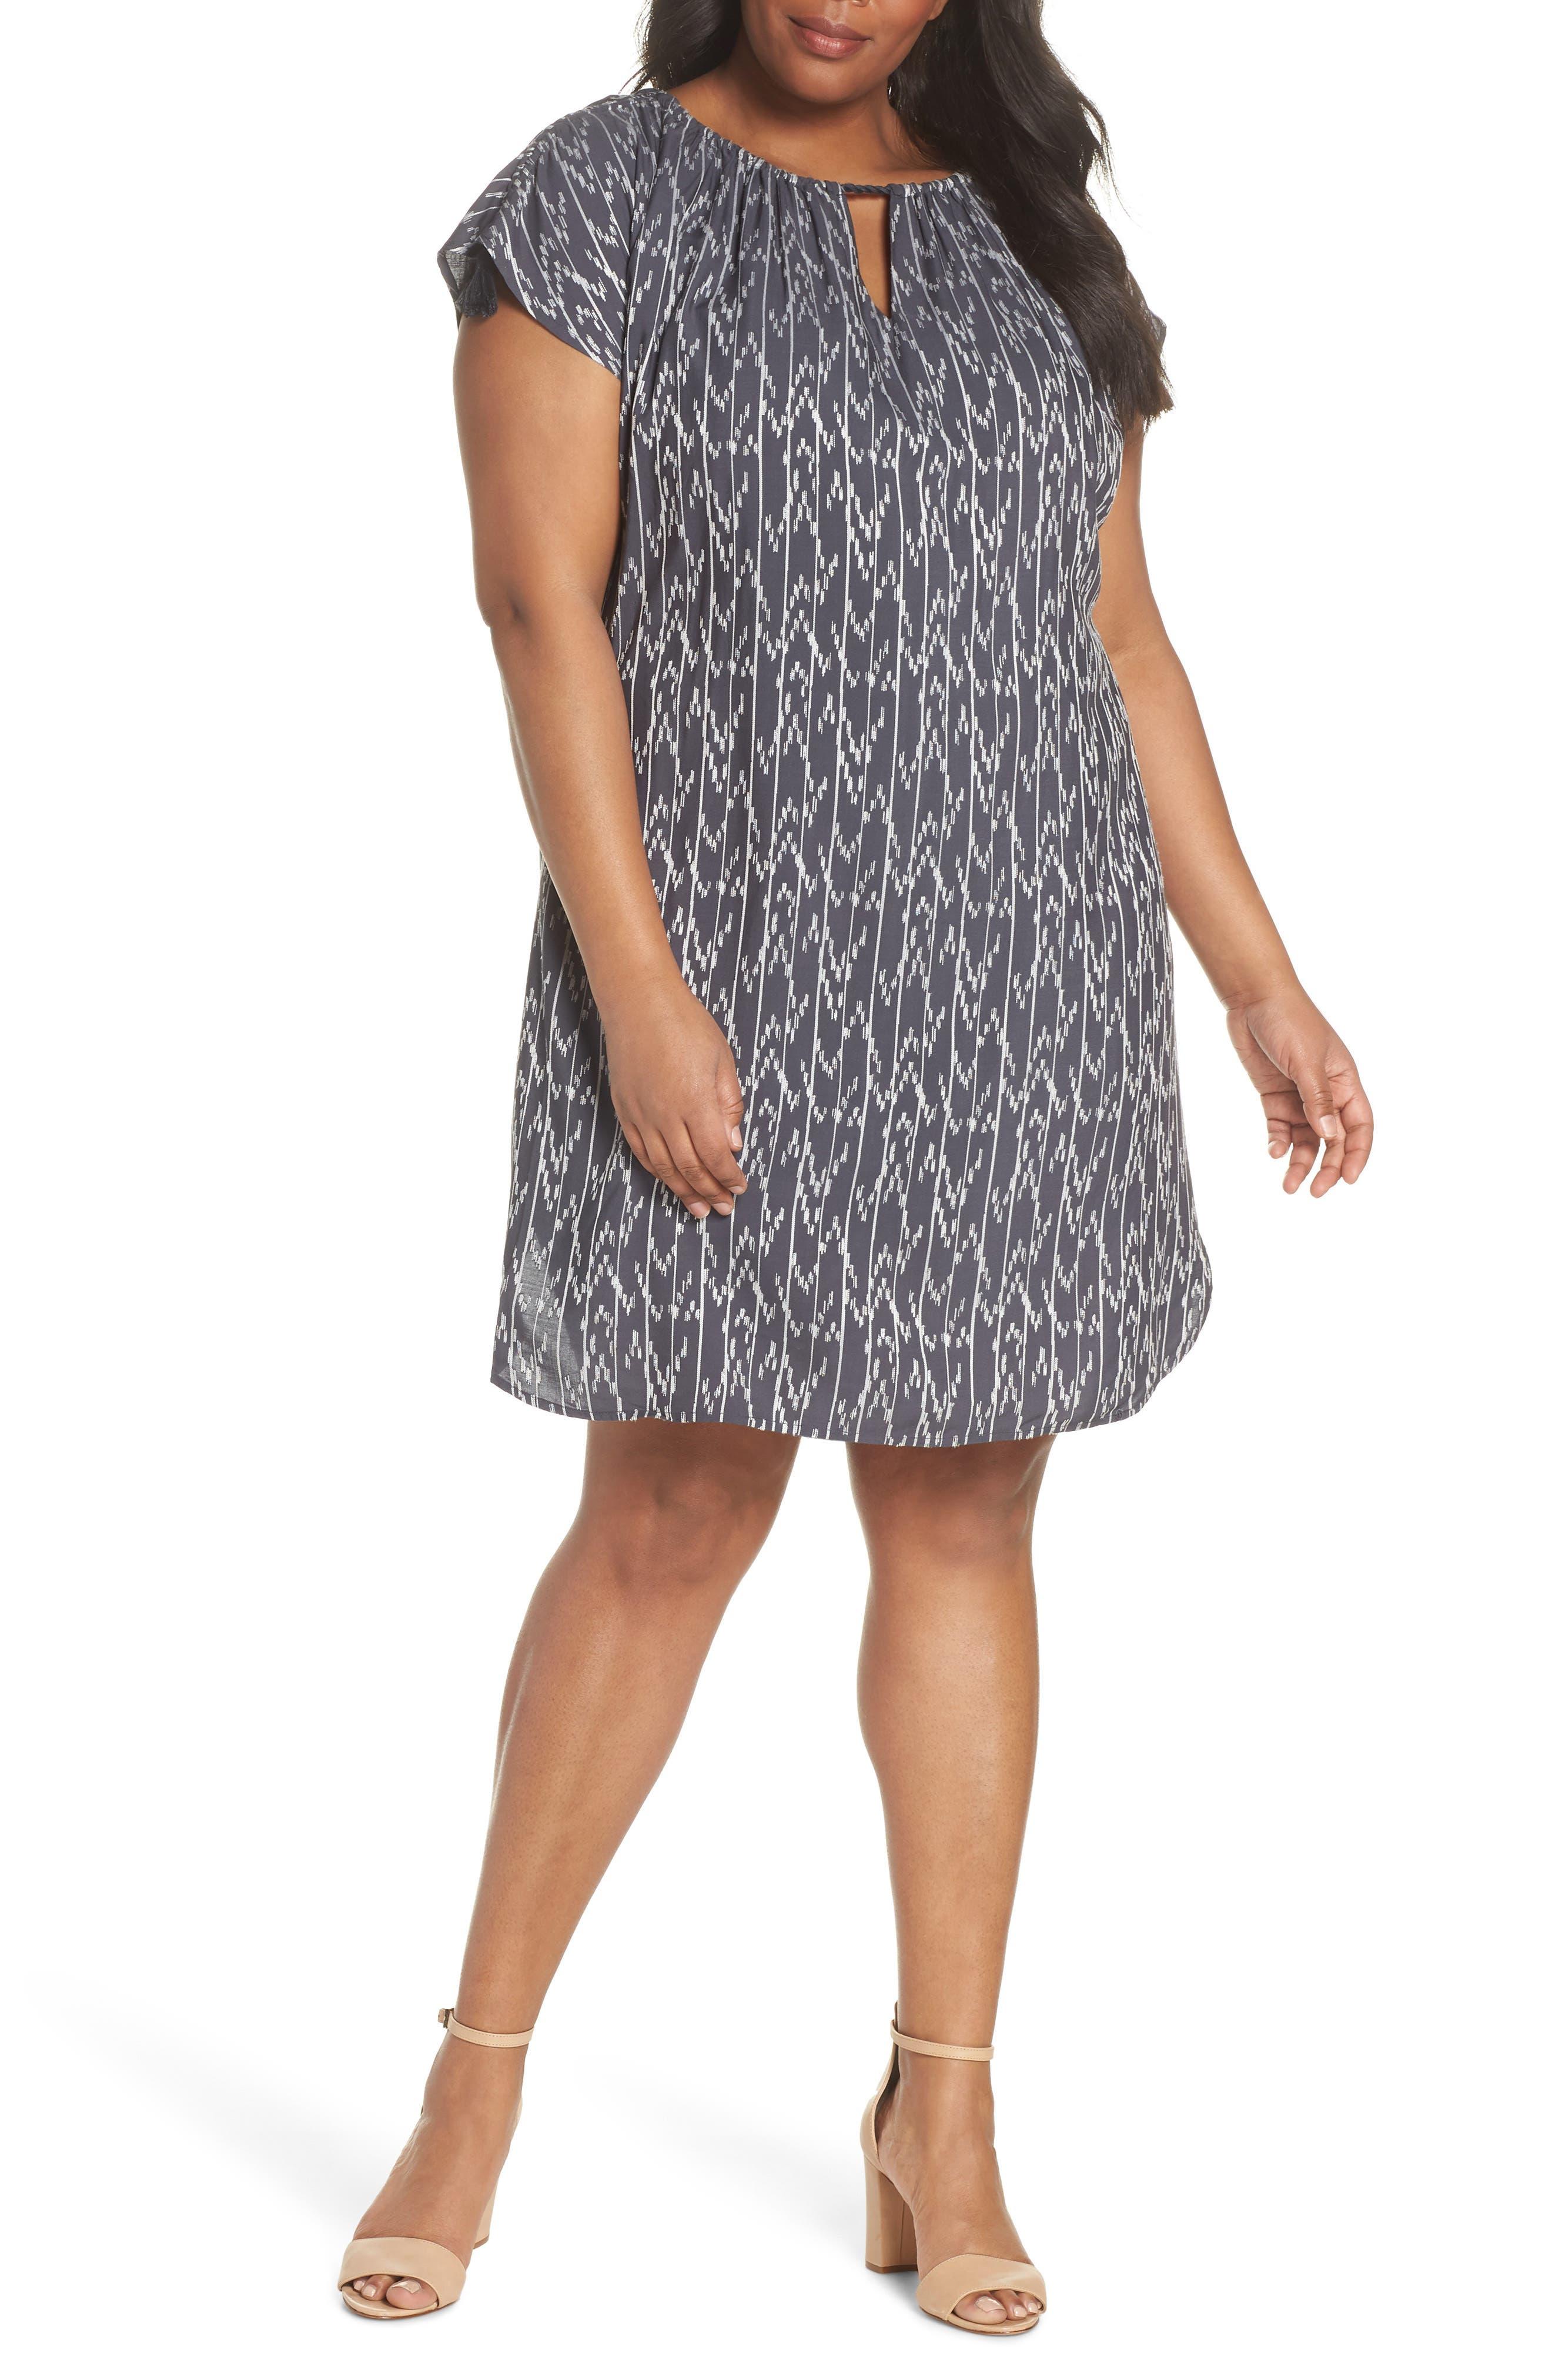 Market Shift Dress,                         Main,                         color, Multi